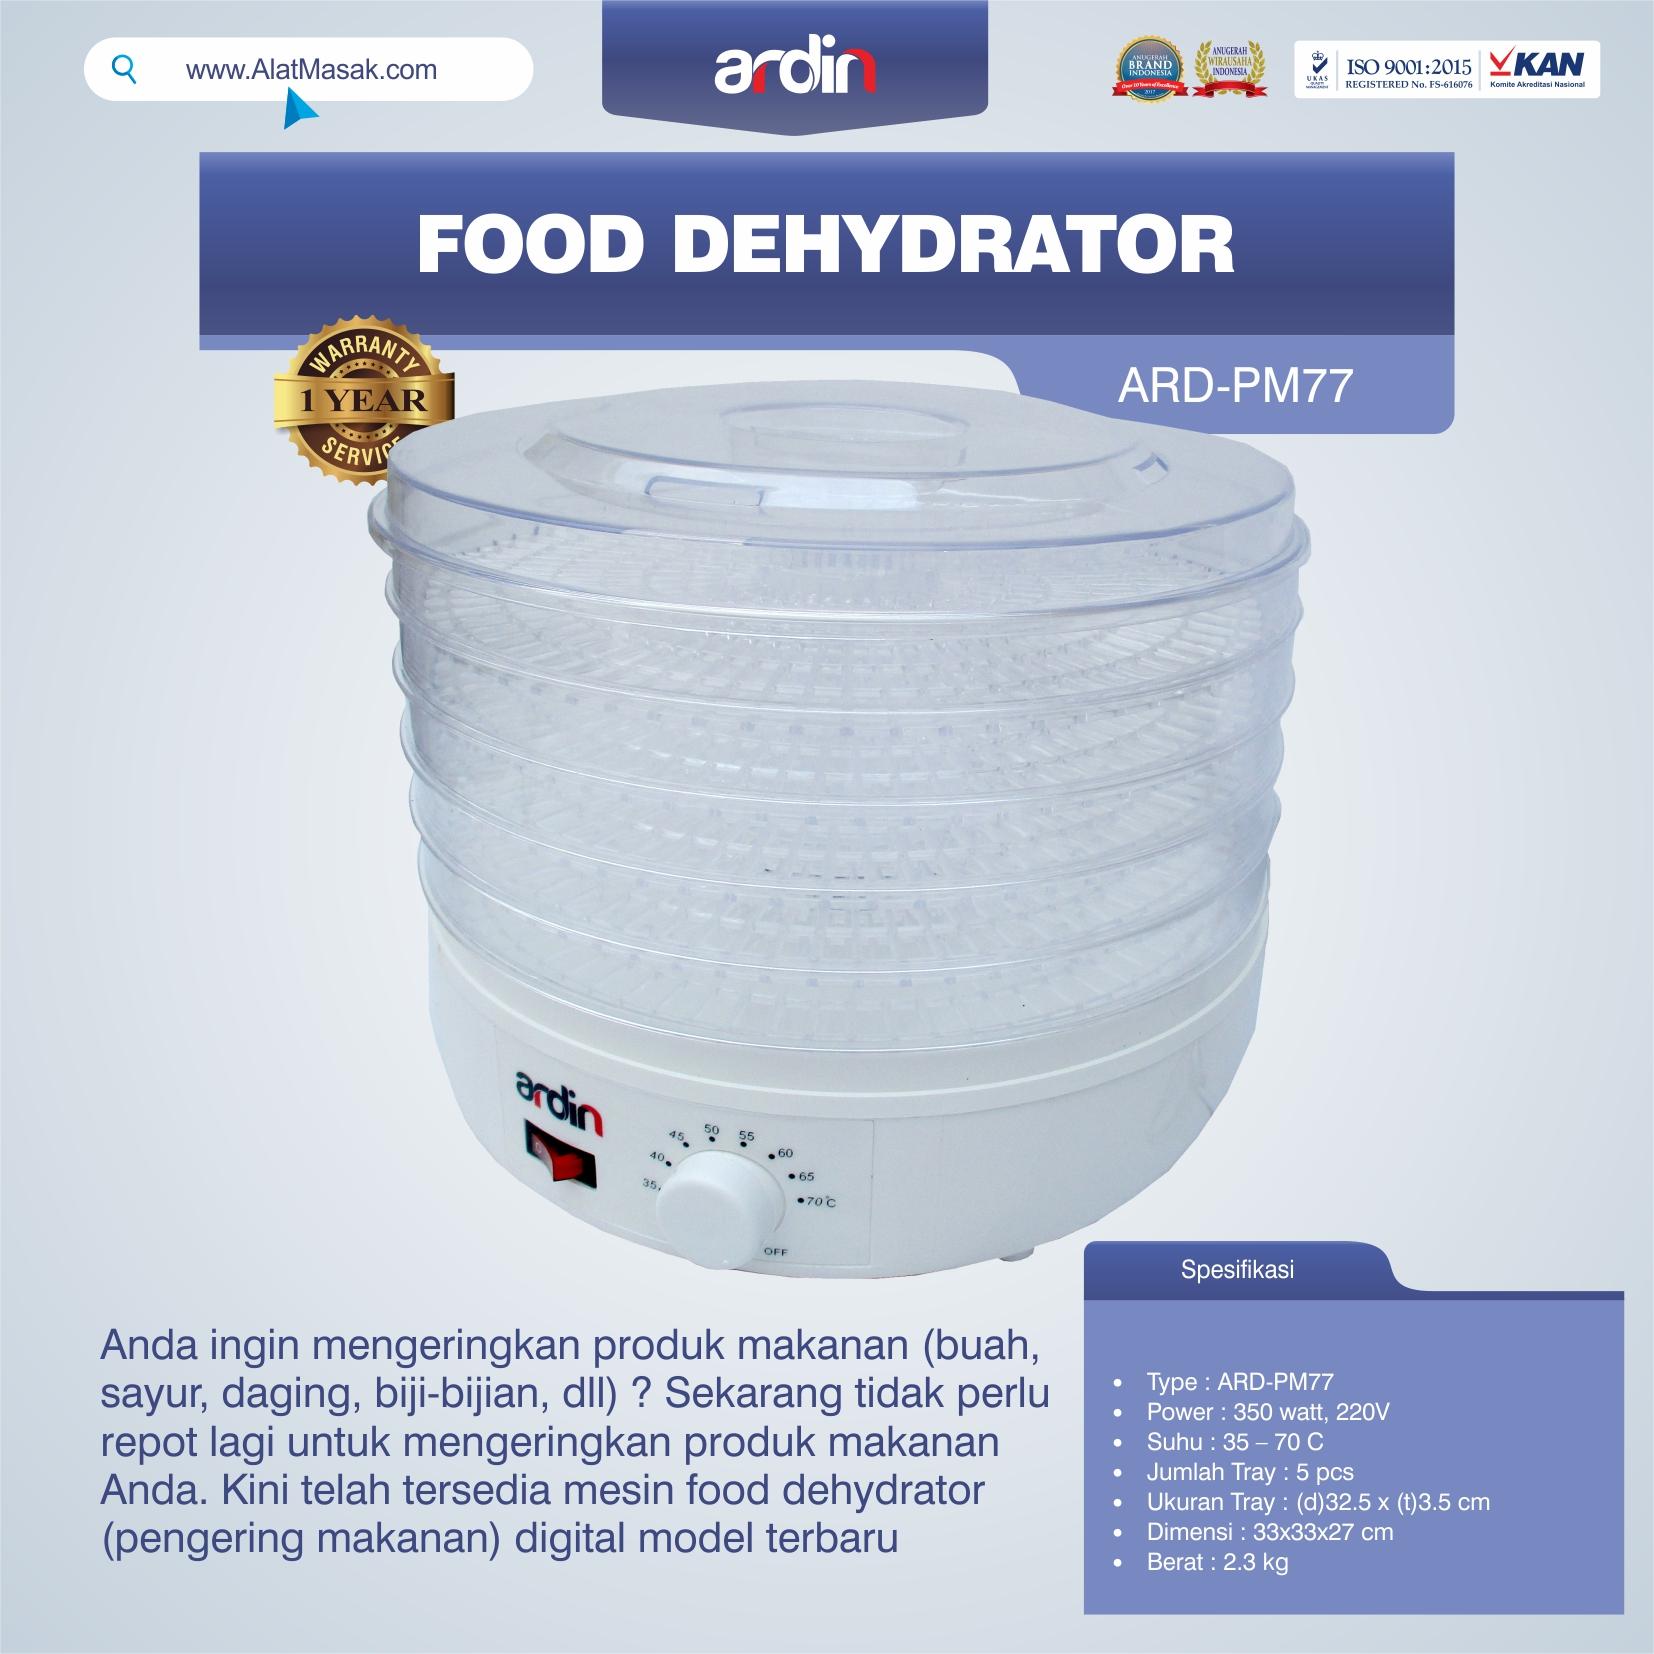 Jual Food Dehydrator ARD-PM77 di Blitar